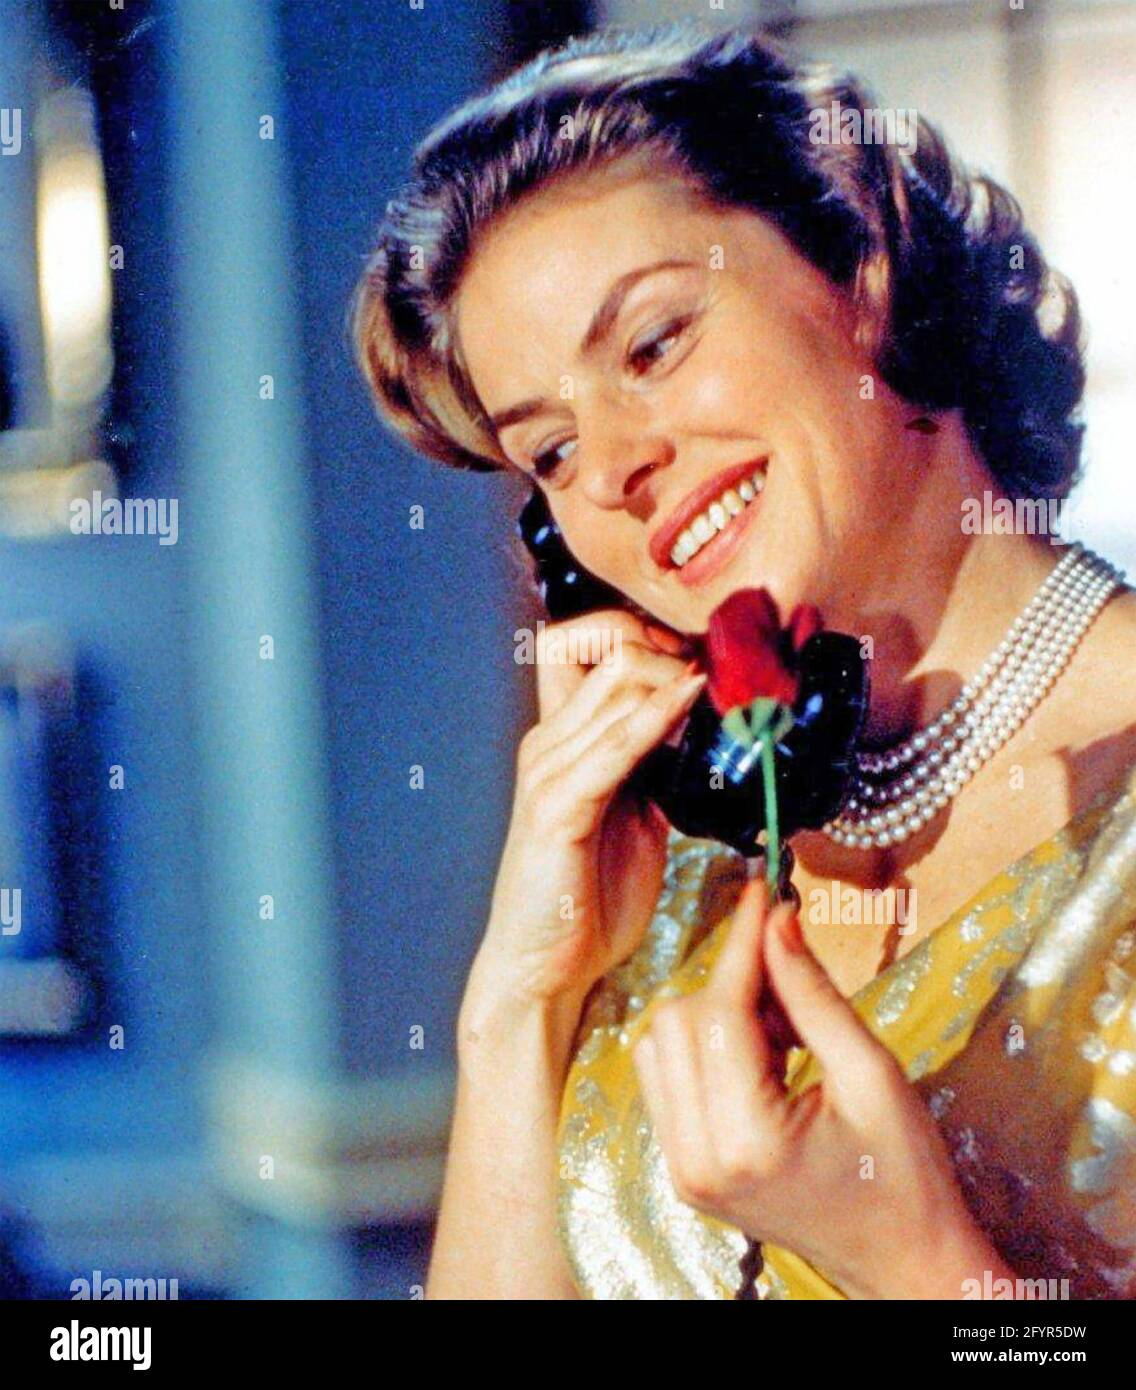 INGRID BERGMAN (1915-1982) actriz sueca sobre 1955 Foto de stock